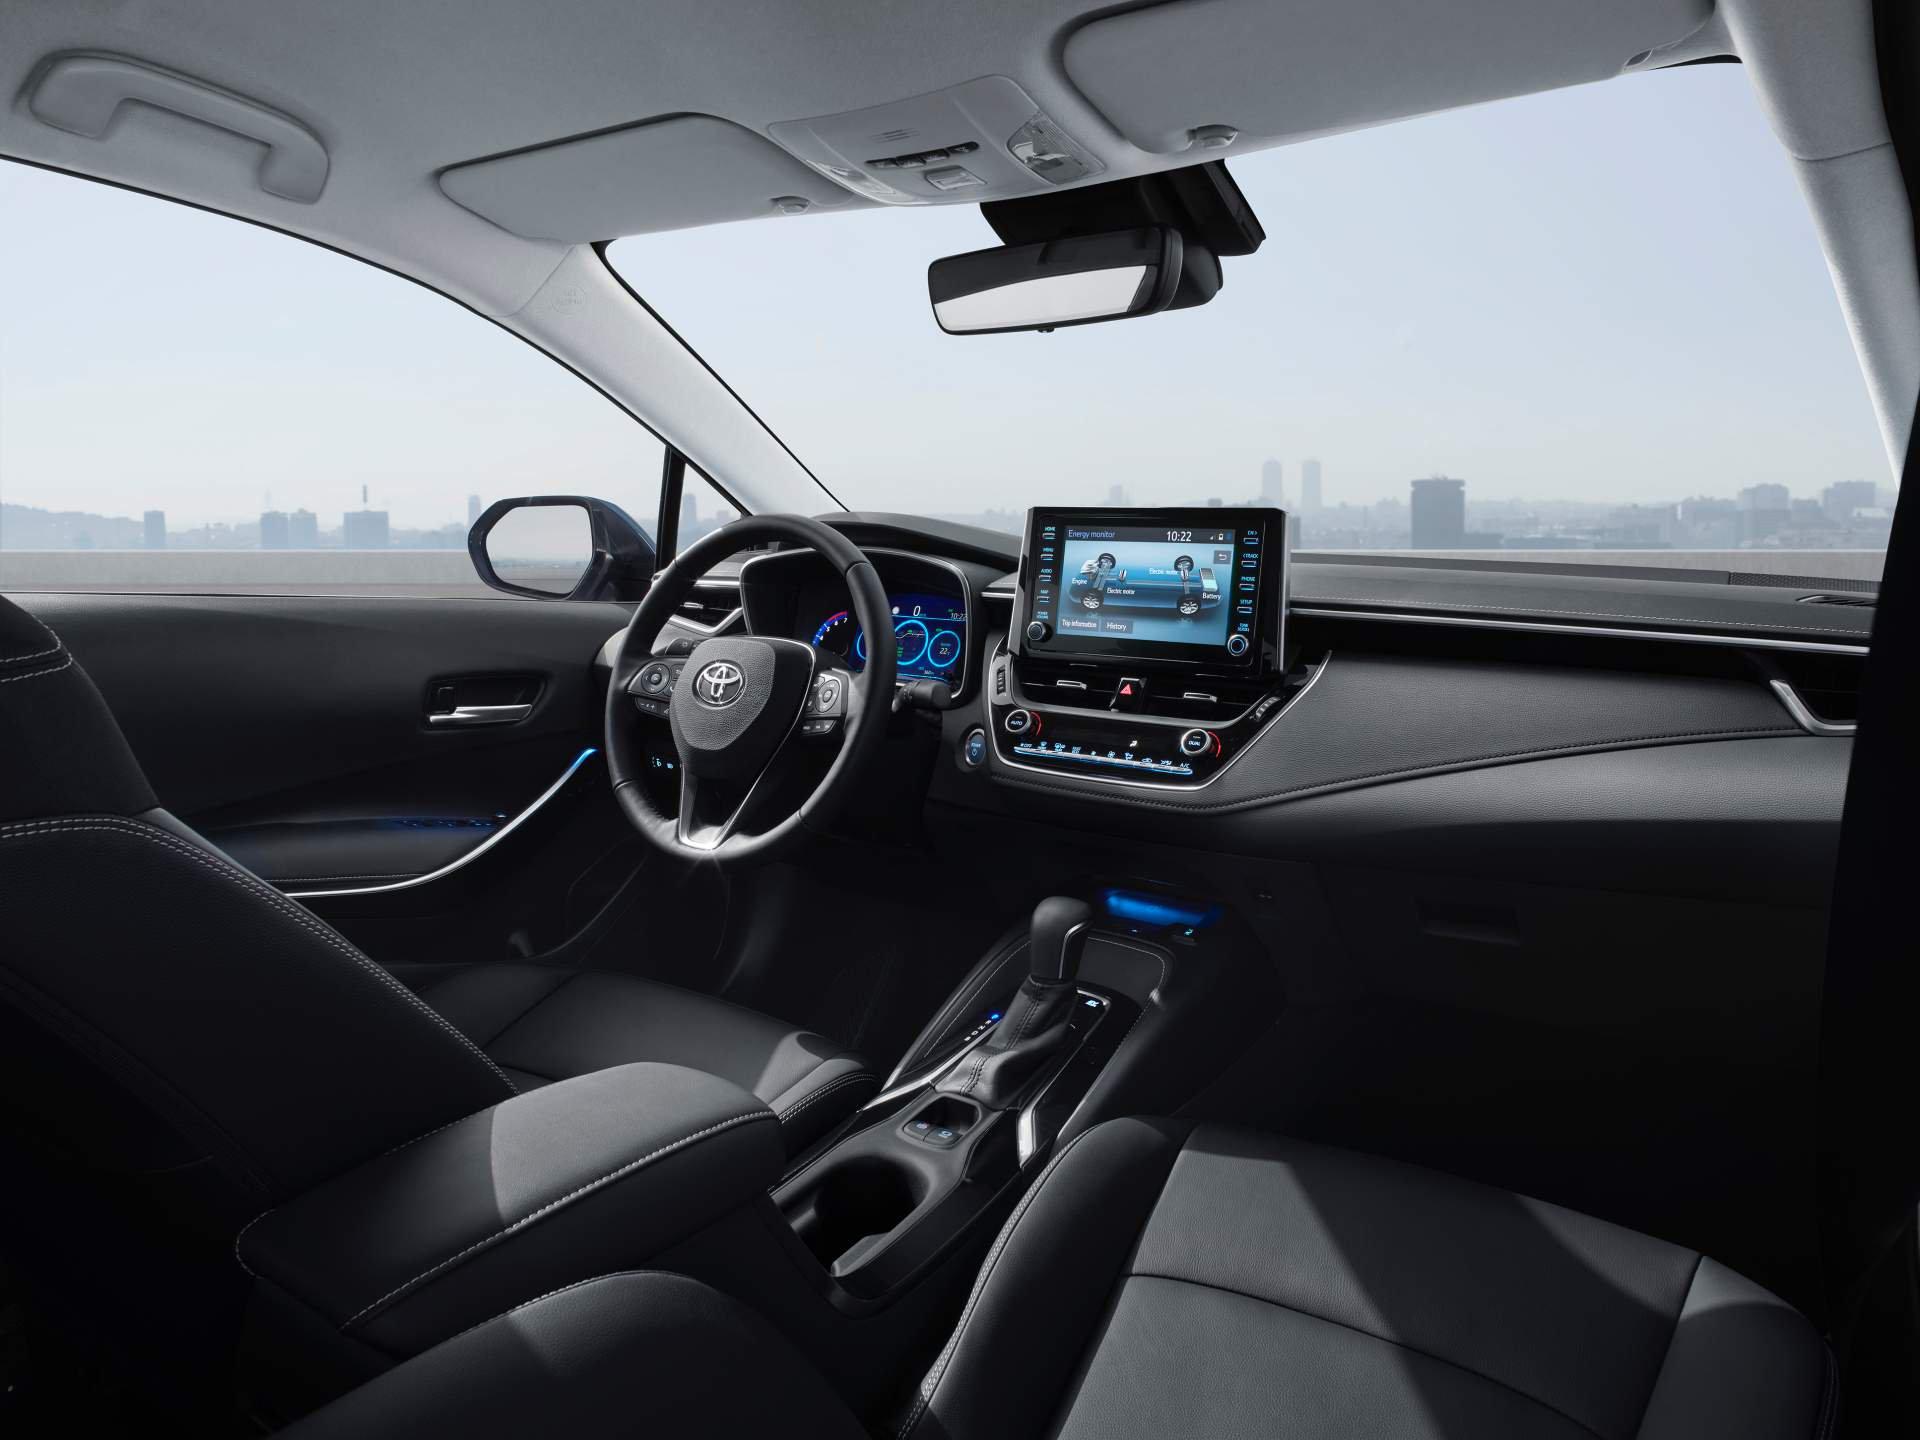 Kekurangan Nova Toyota Corolla Murah Berkualitas